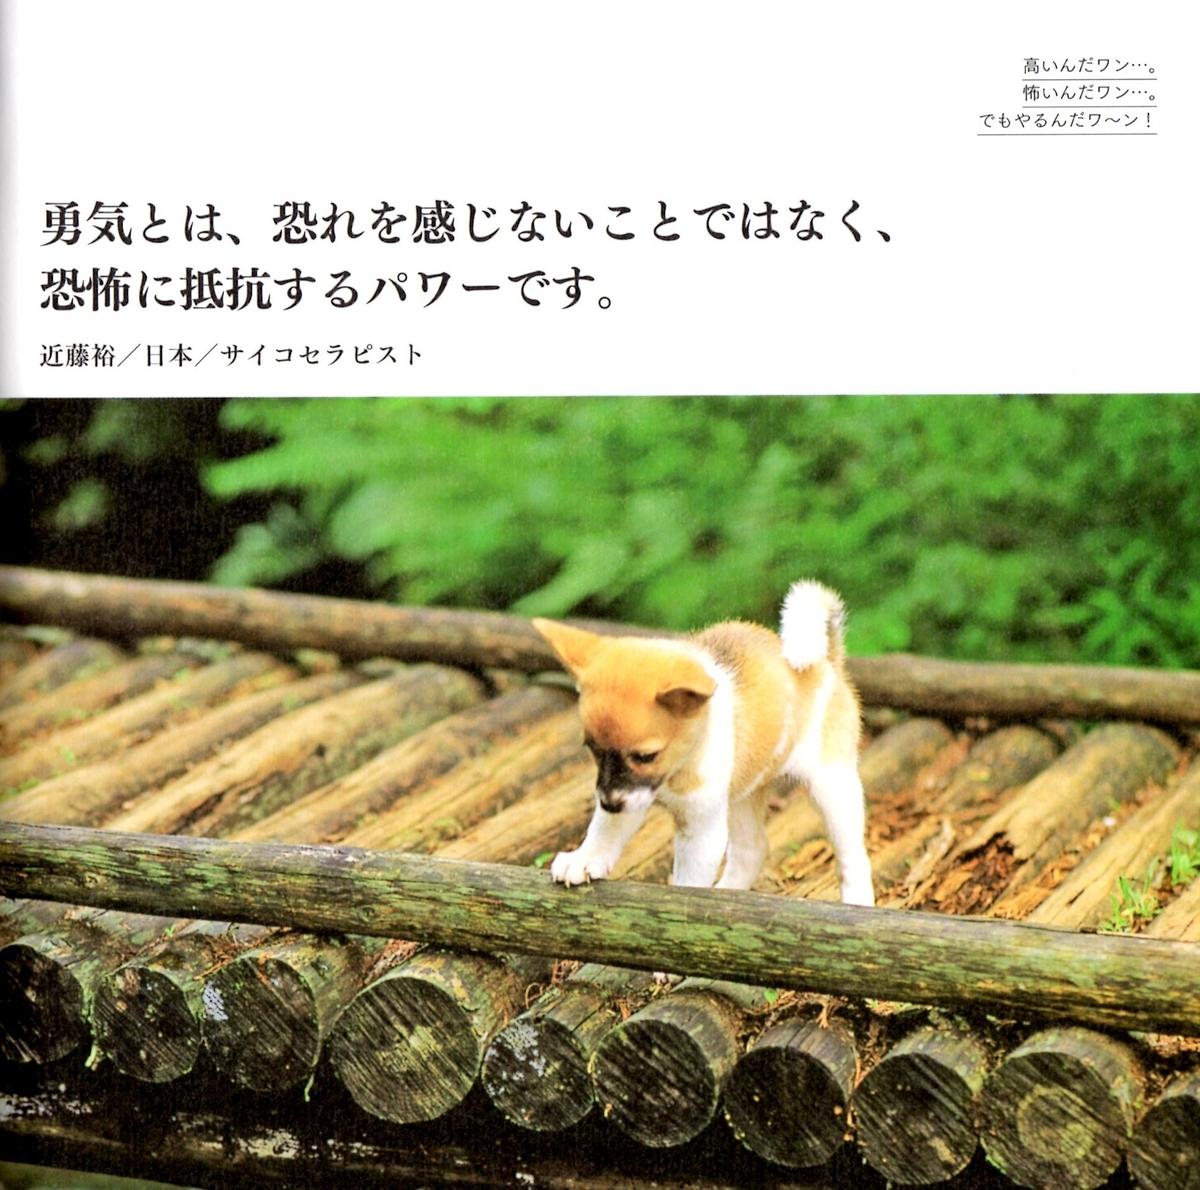 f:id:hamasansu:20190620002224j:plain